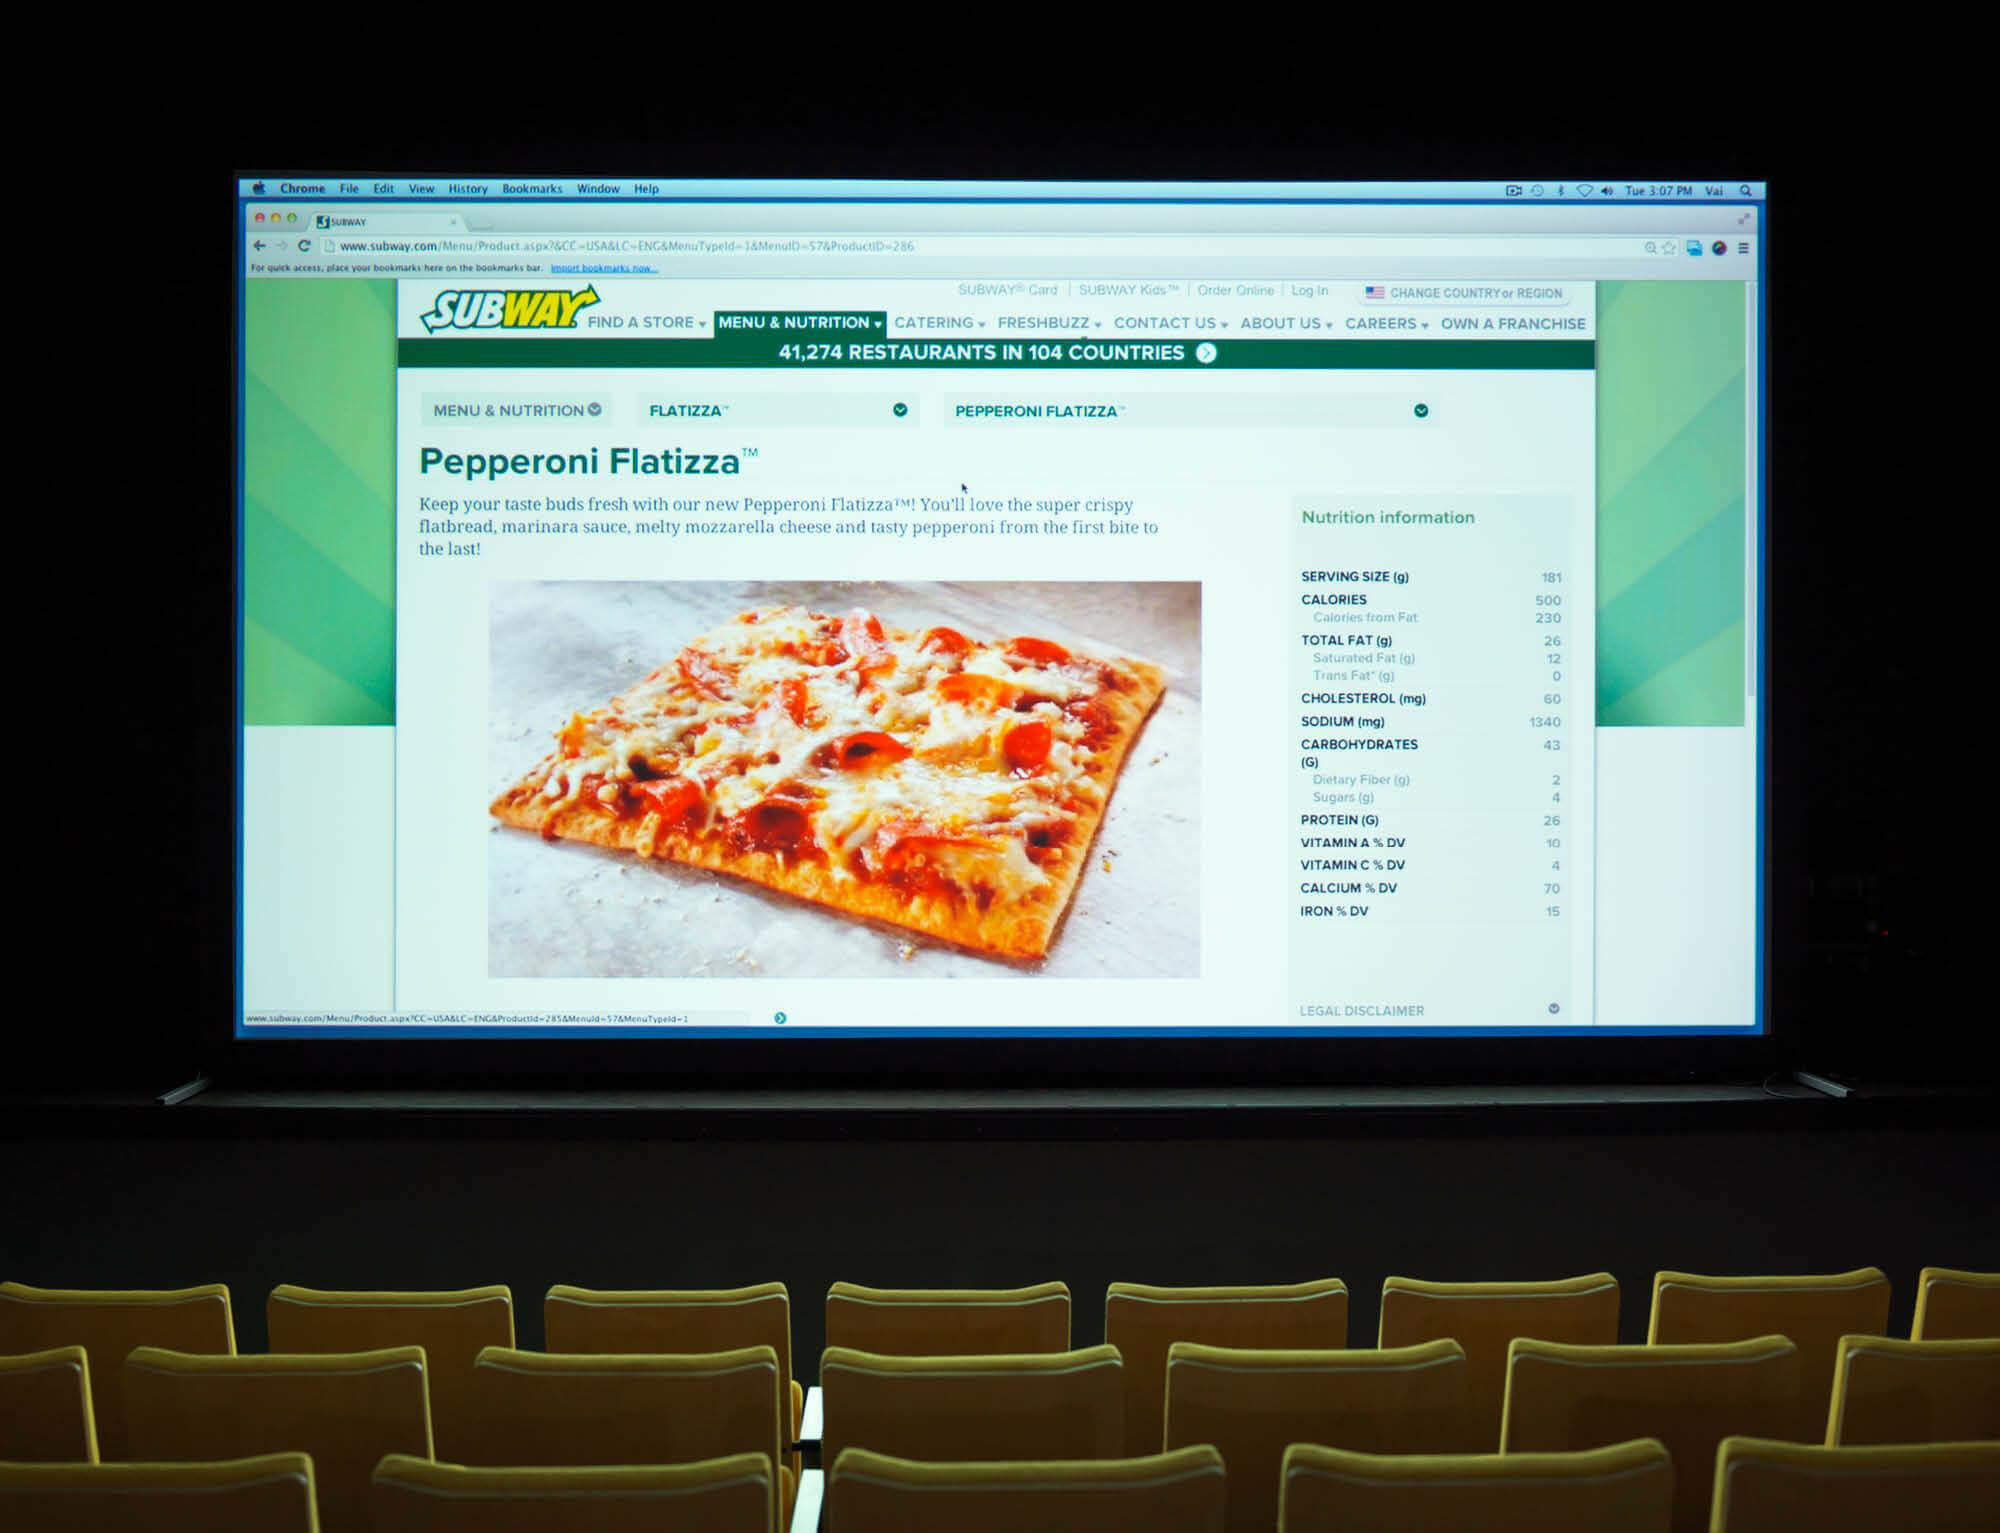 Spotlight Screenings continue with FRESHBUZZ (subway.com) by Cory Arcangel